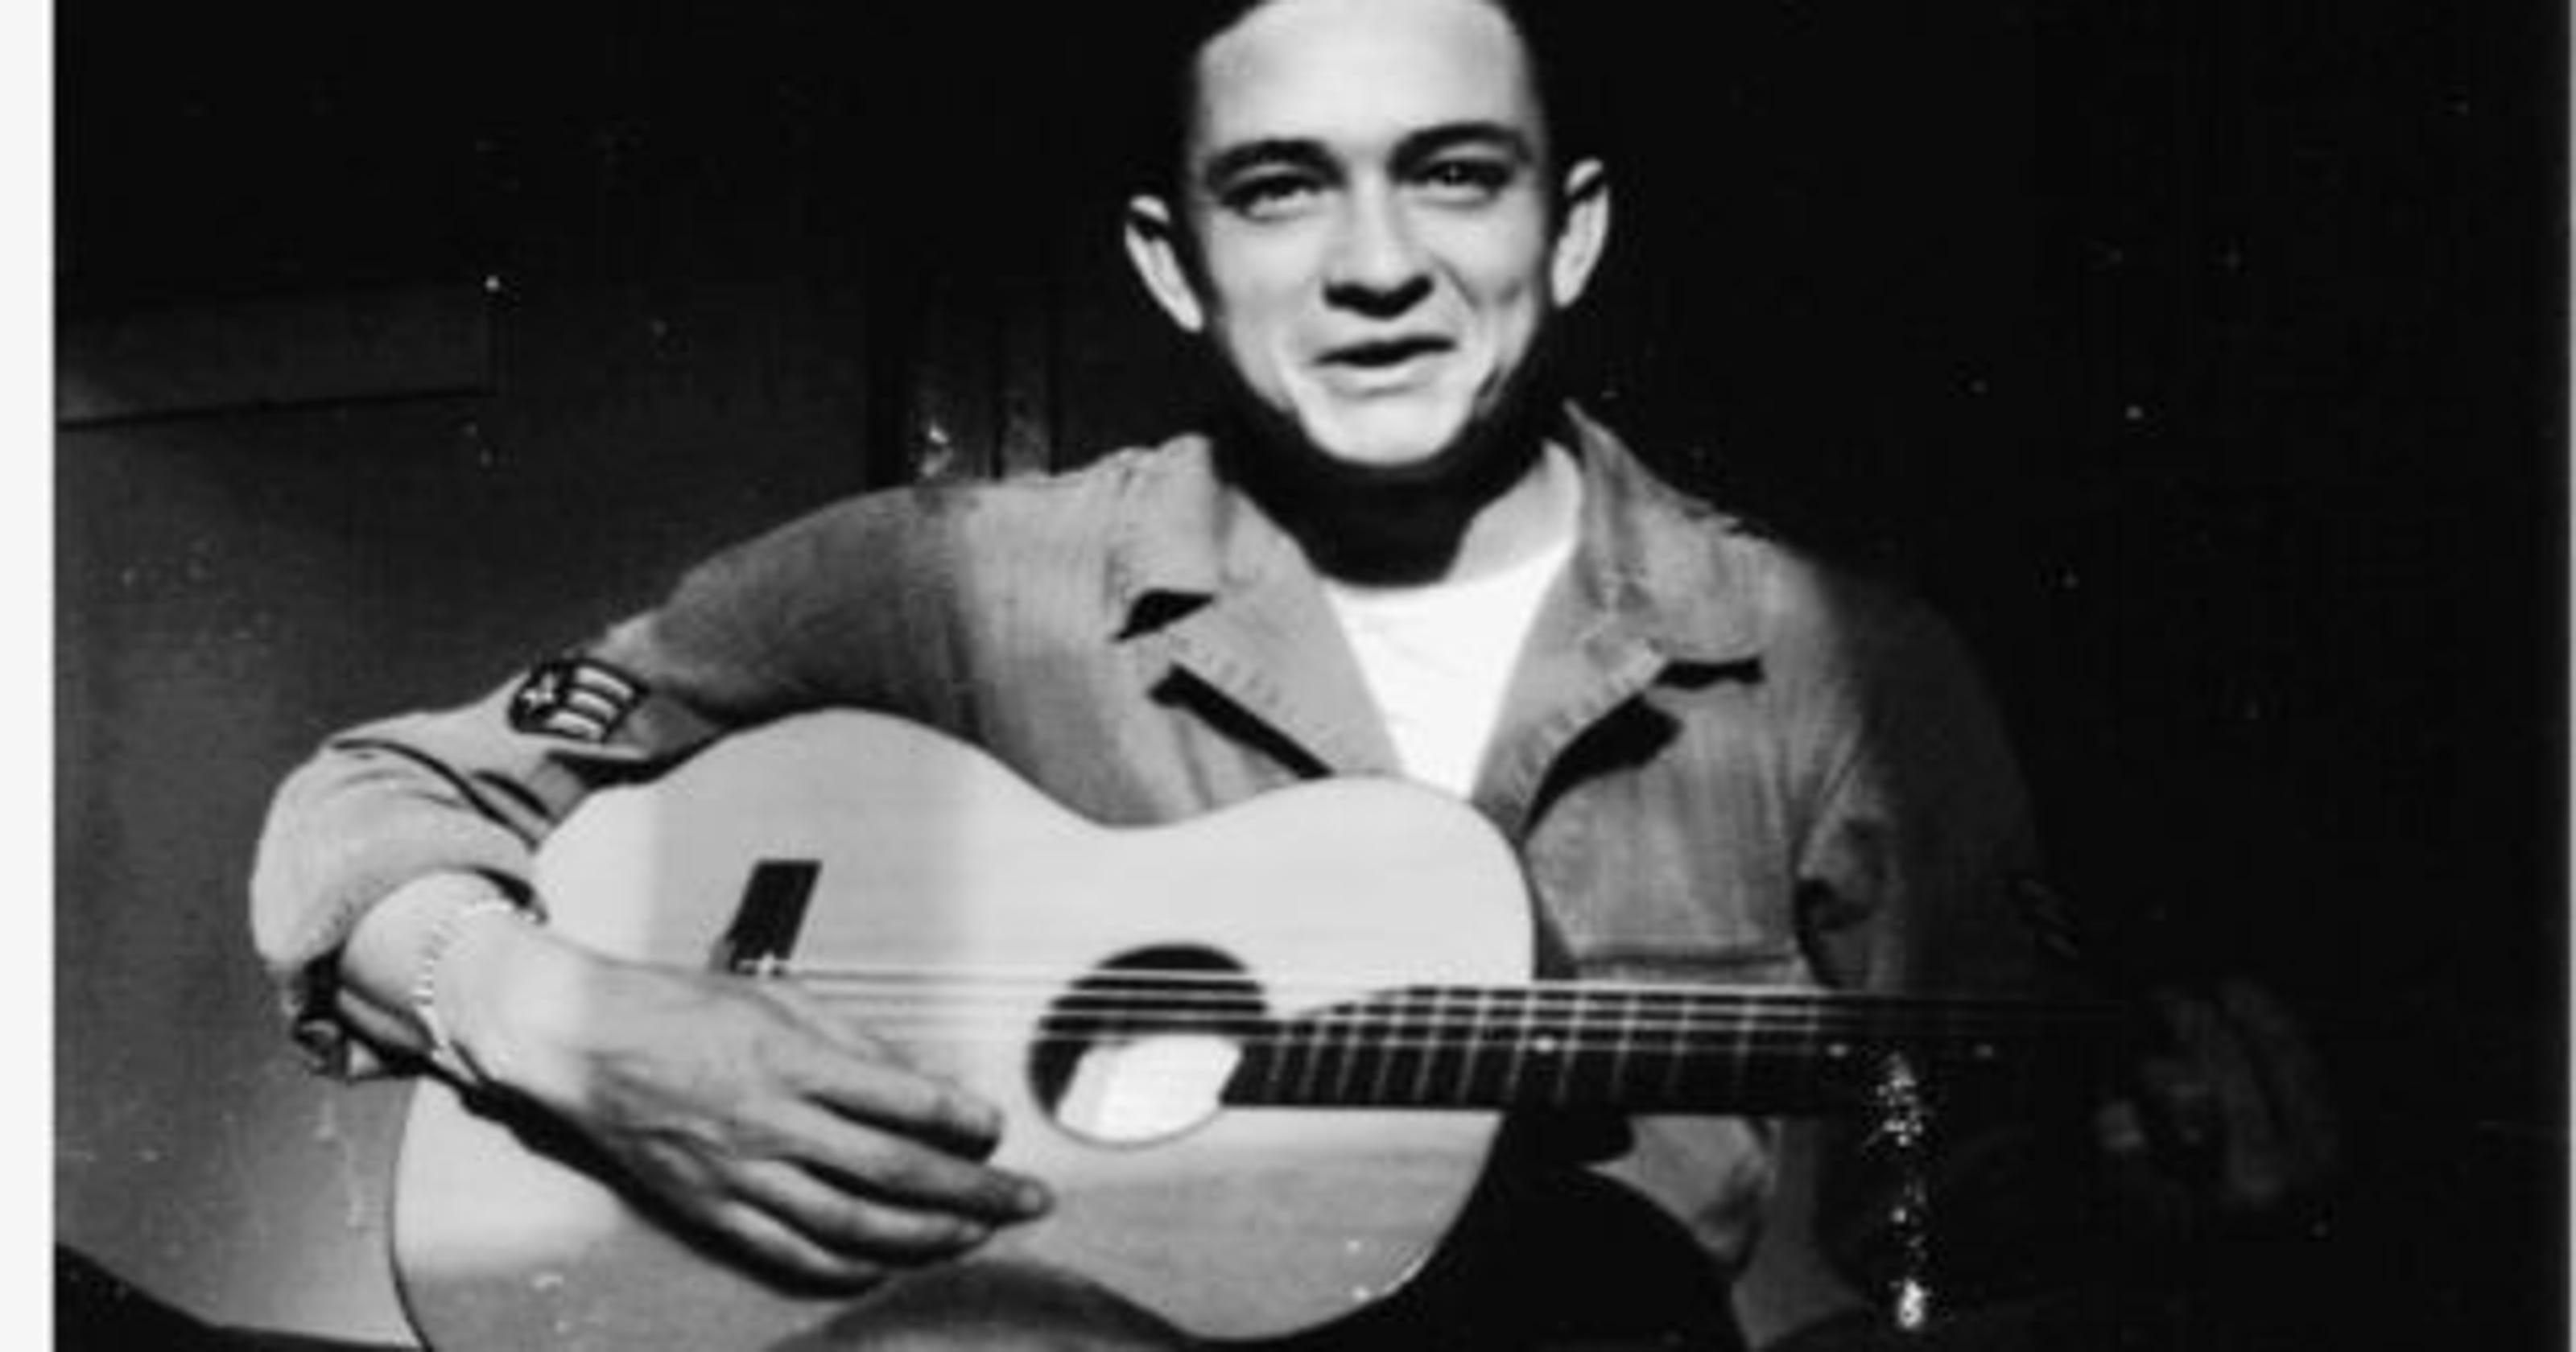 Johnny Cash\'s first wife tells of romance, heartbreak